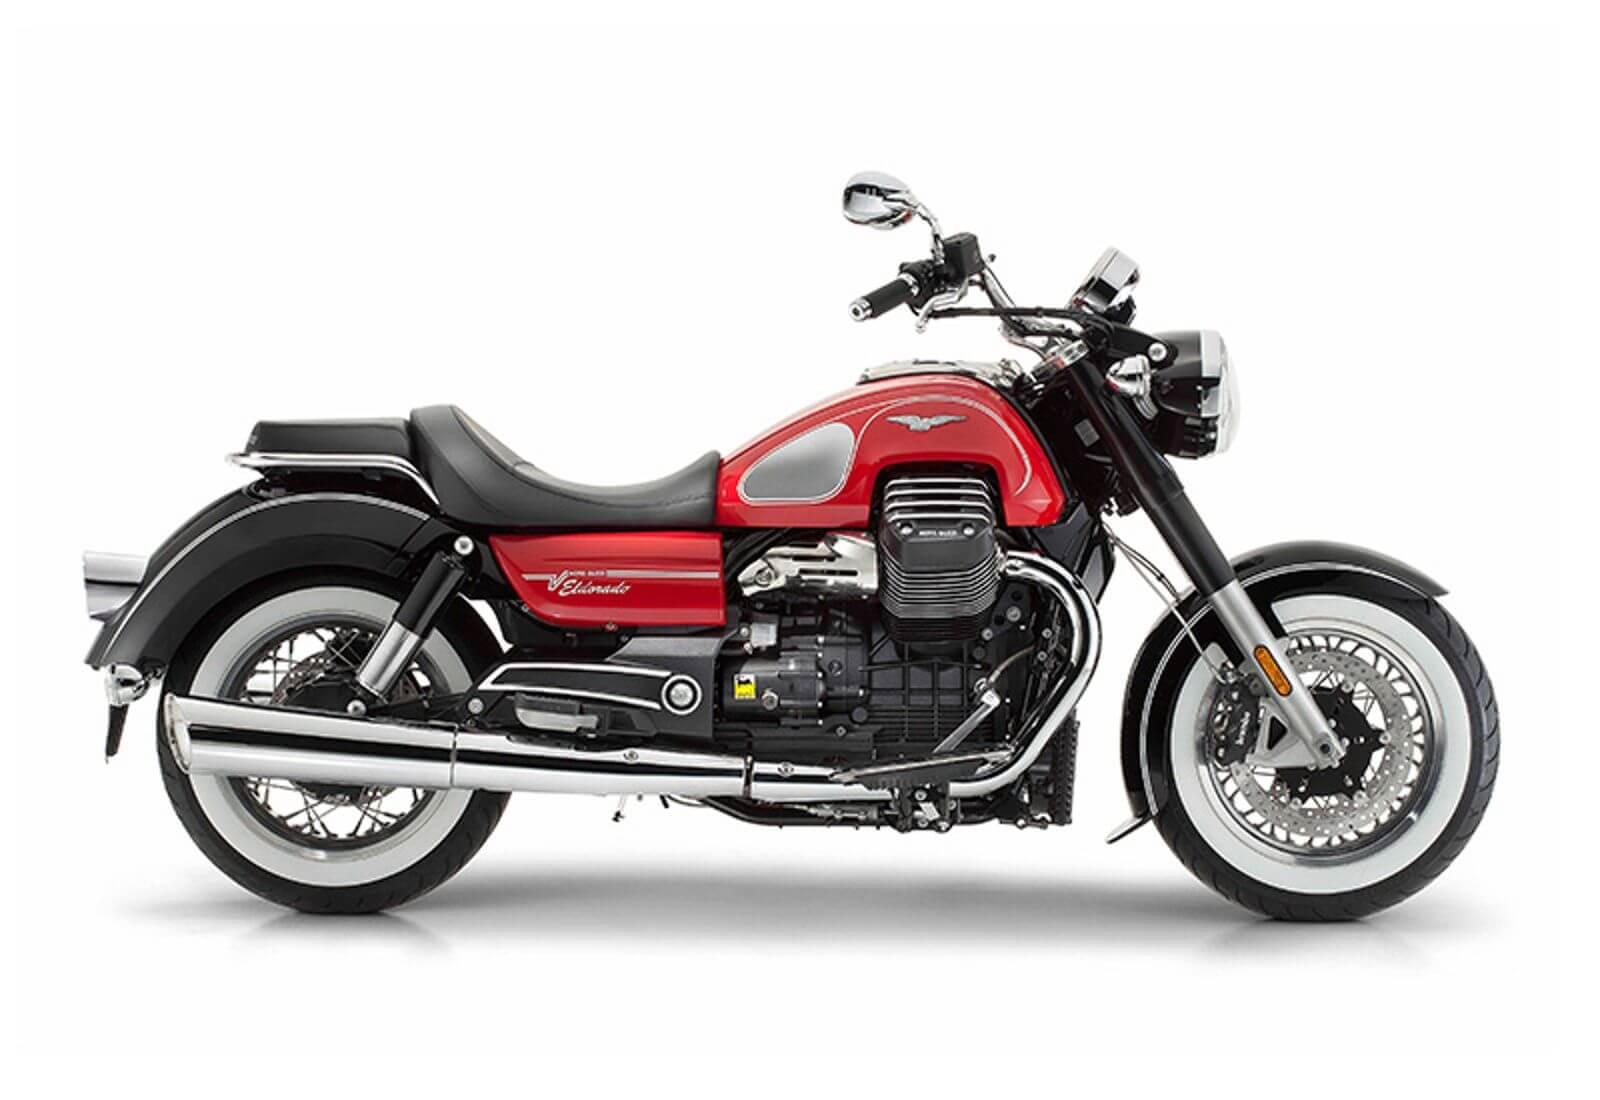 Moto Guzzi Eldorado red